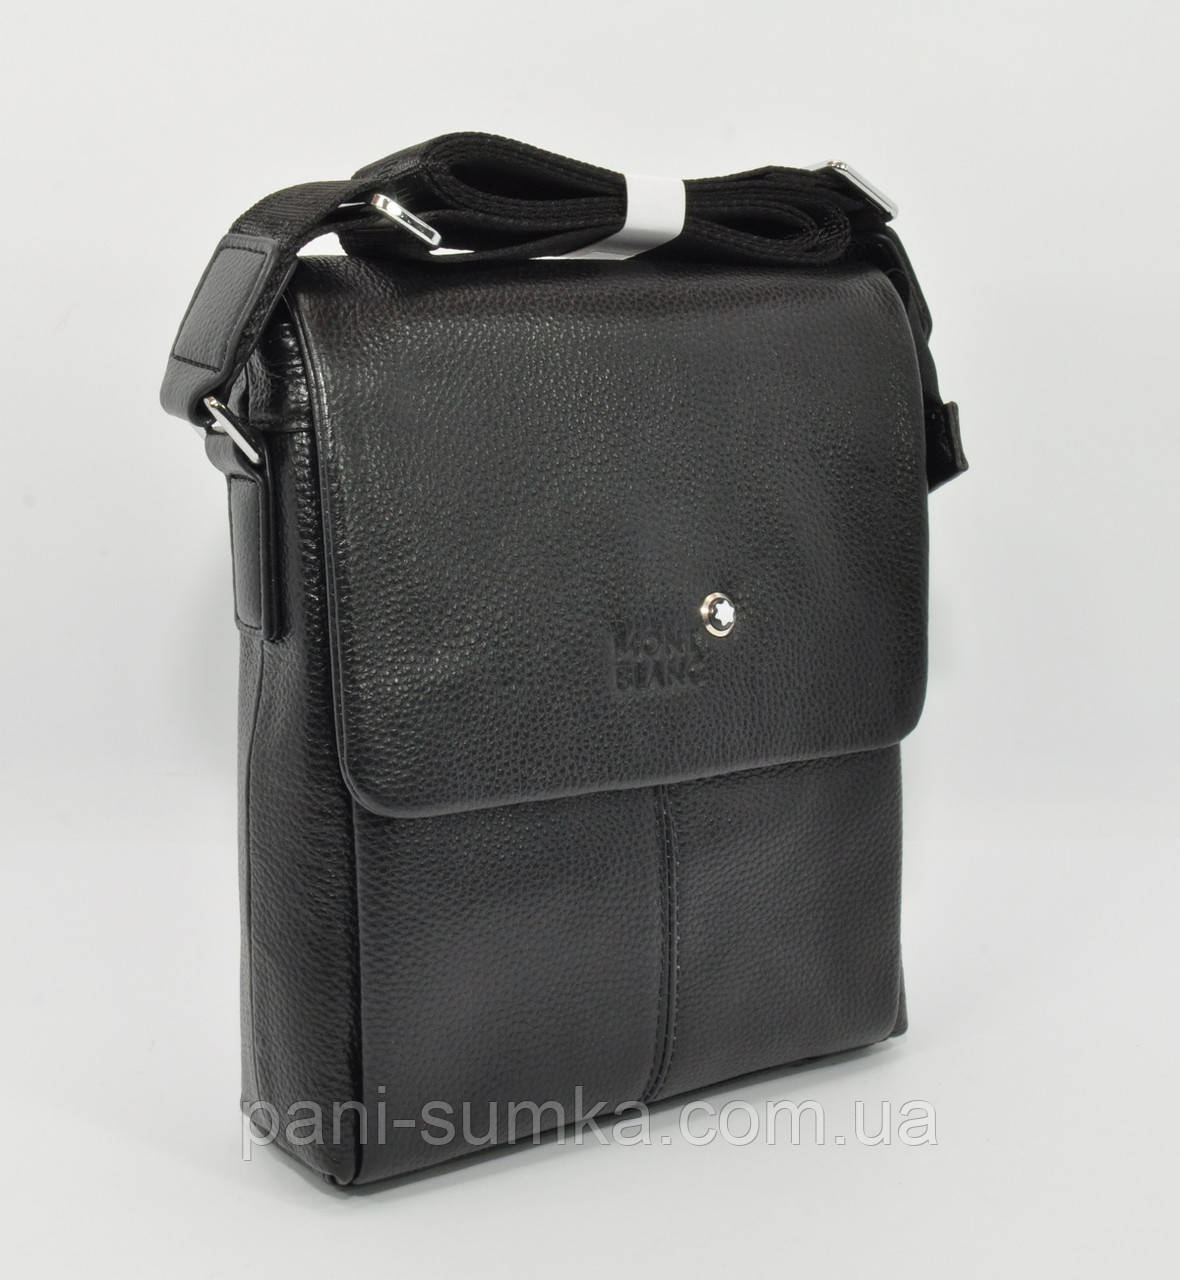 Мужская кожаная сумка Montblanc 9068-2 черная средняя  продажа, цена ... 024eb6061ef